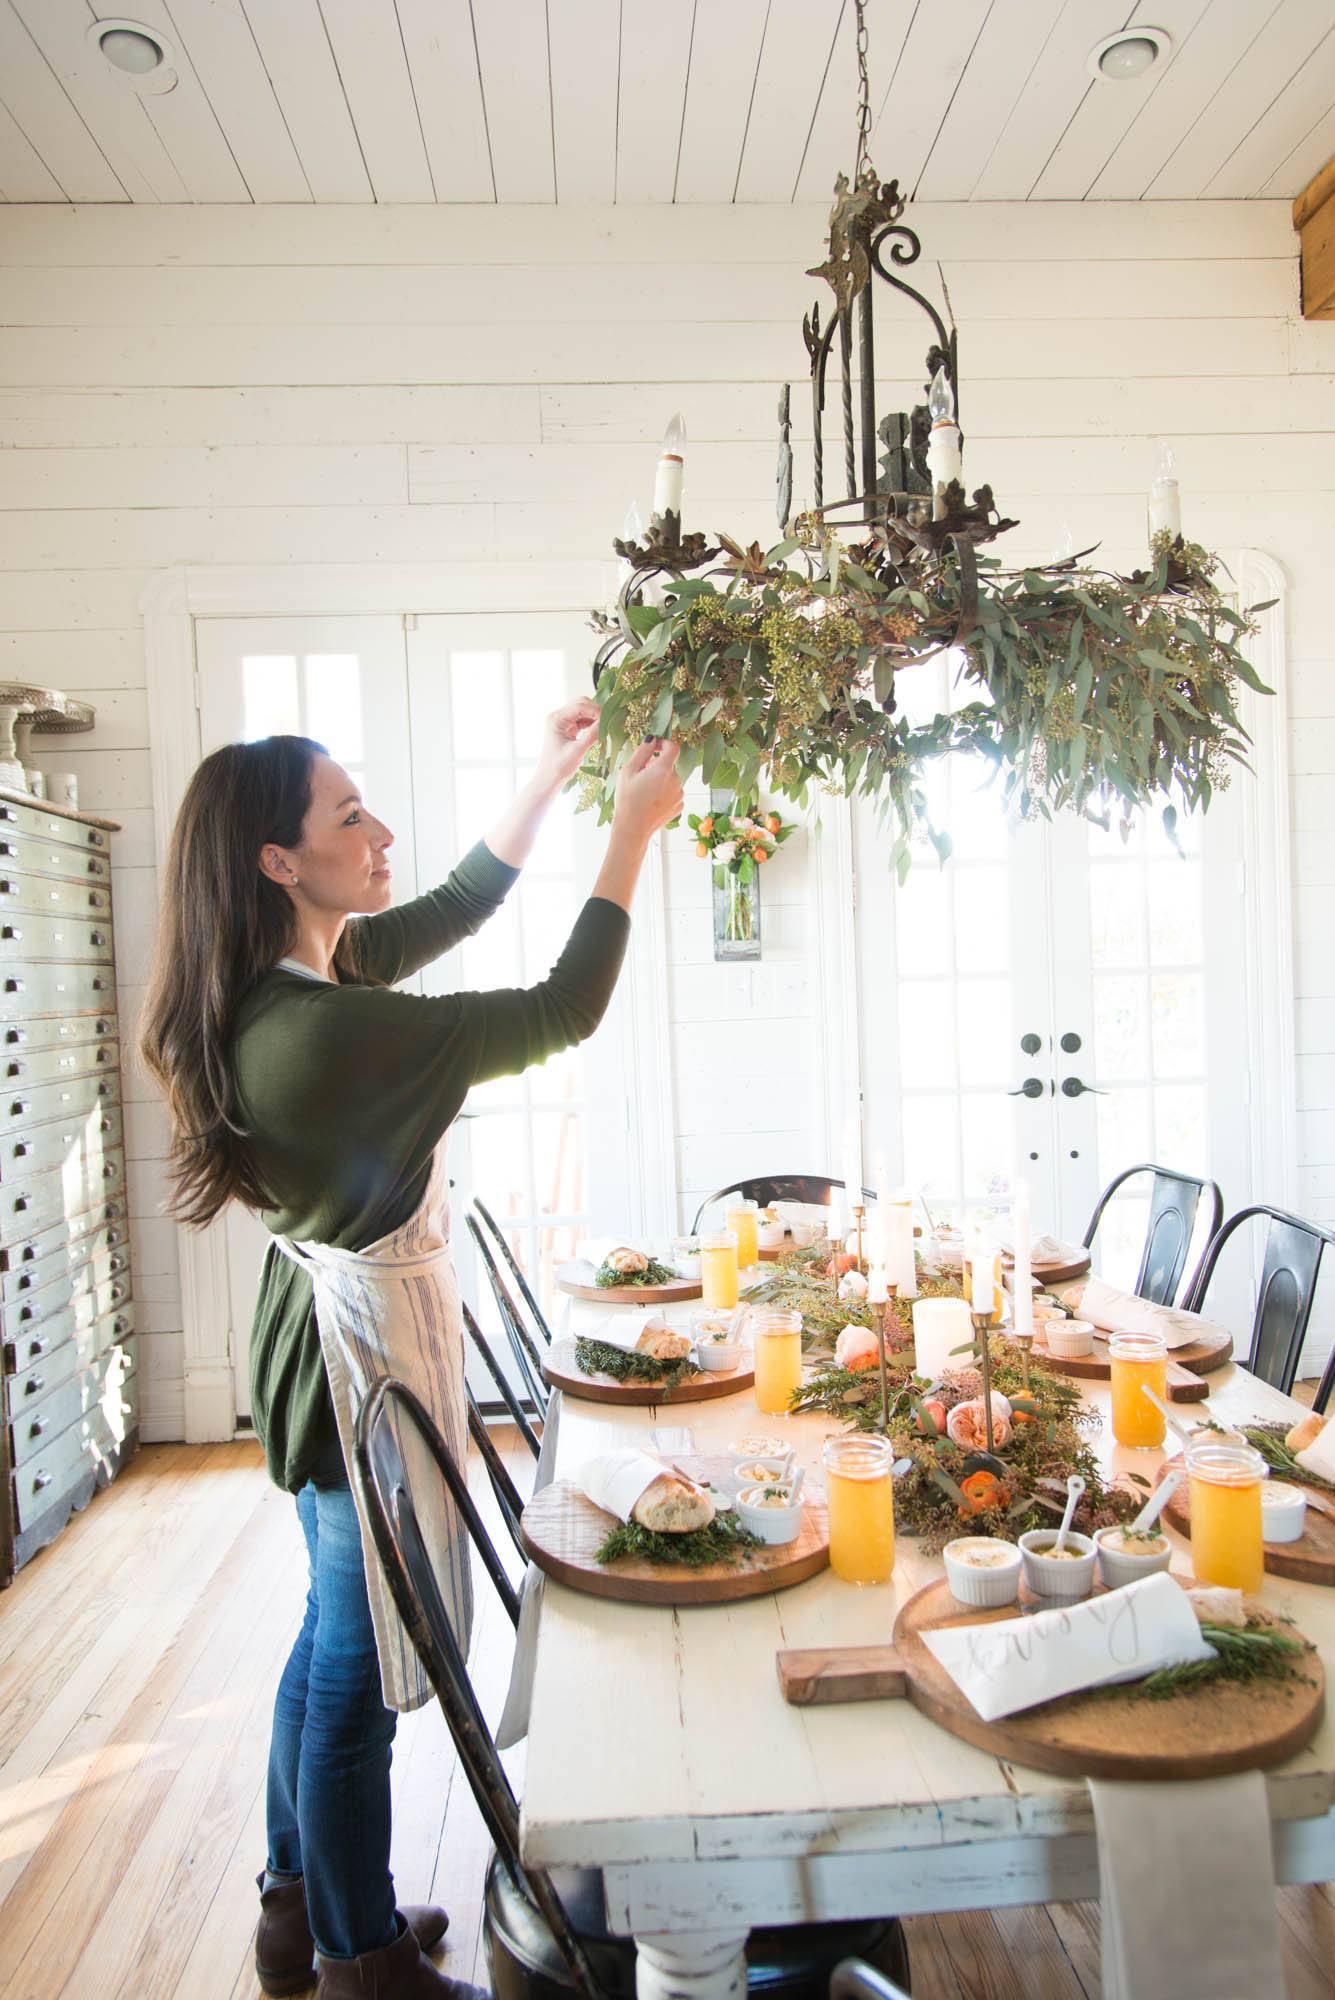 Joanna Gaines decorating chandelier